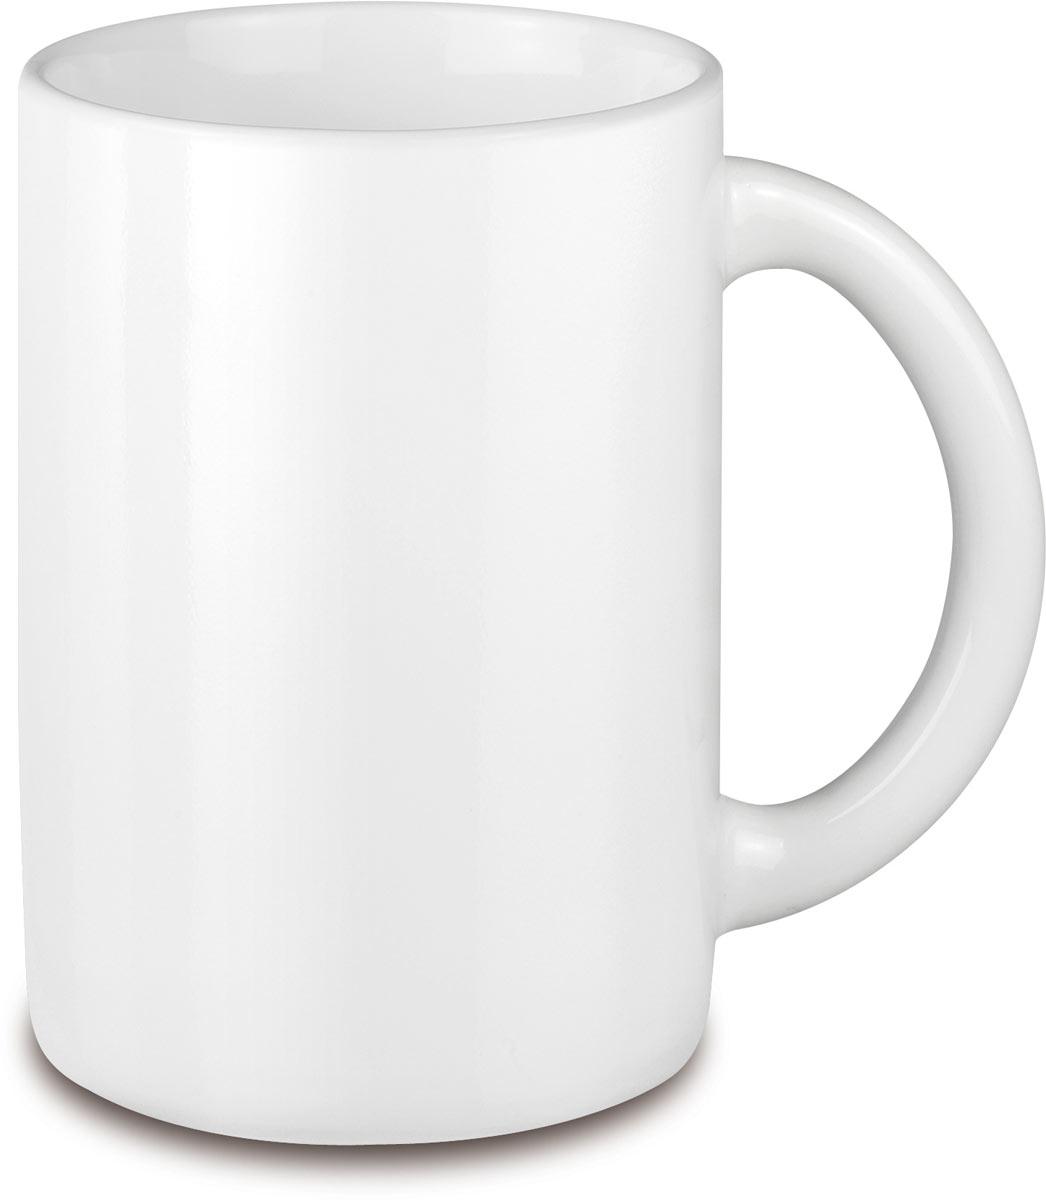 mugs discount mug pas cher mugs publicitaires objets publicitaires objet publicitaire. Black Bedroom Furniture Sets. Home Design Ideas